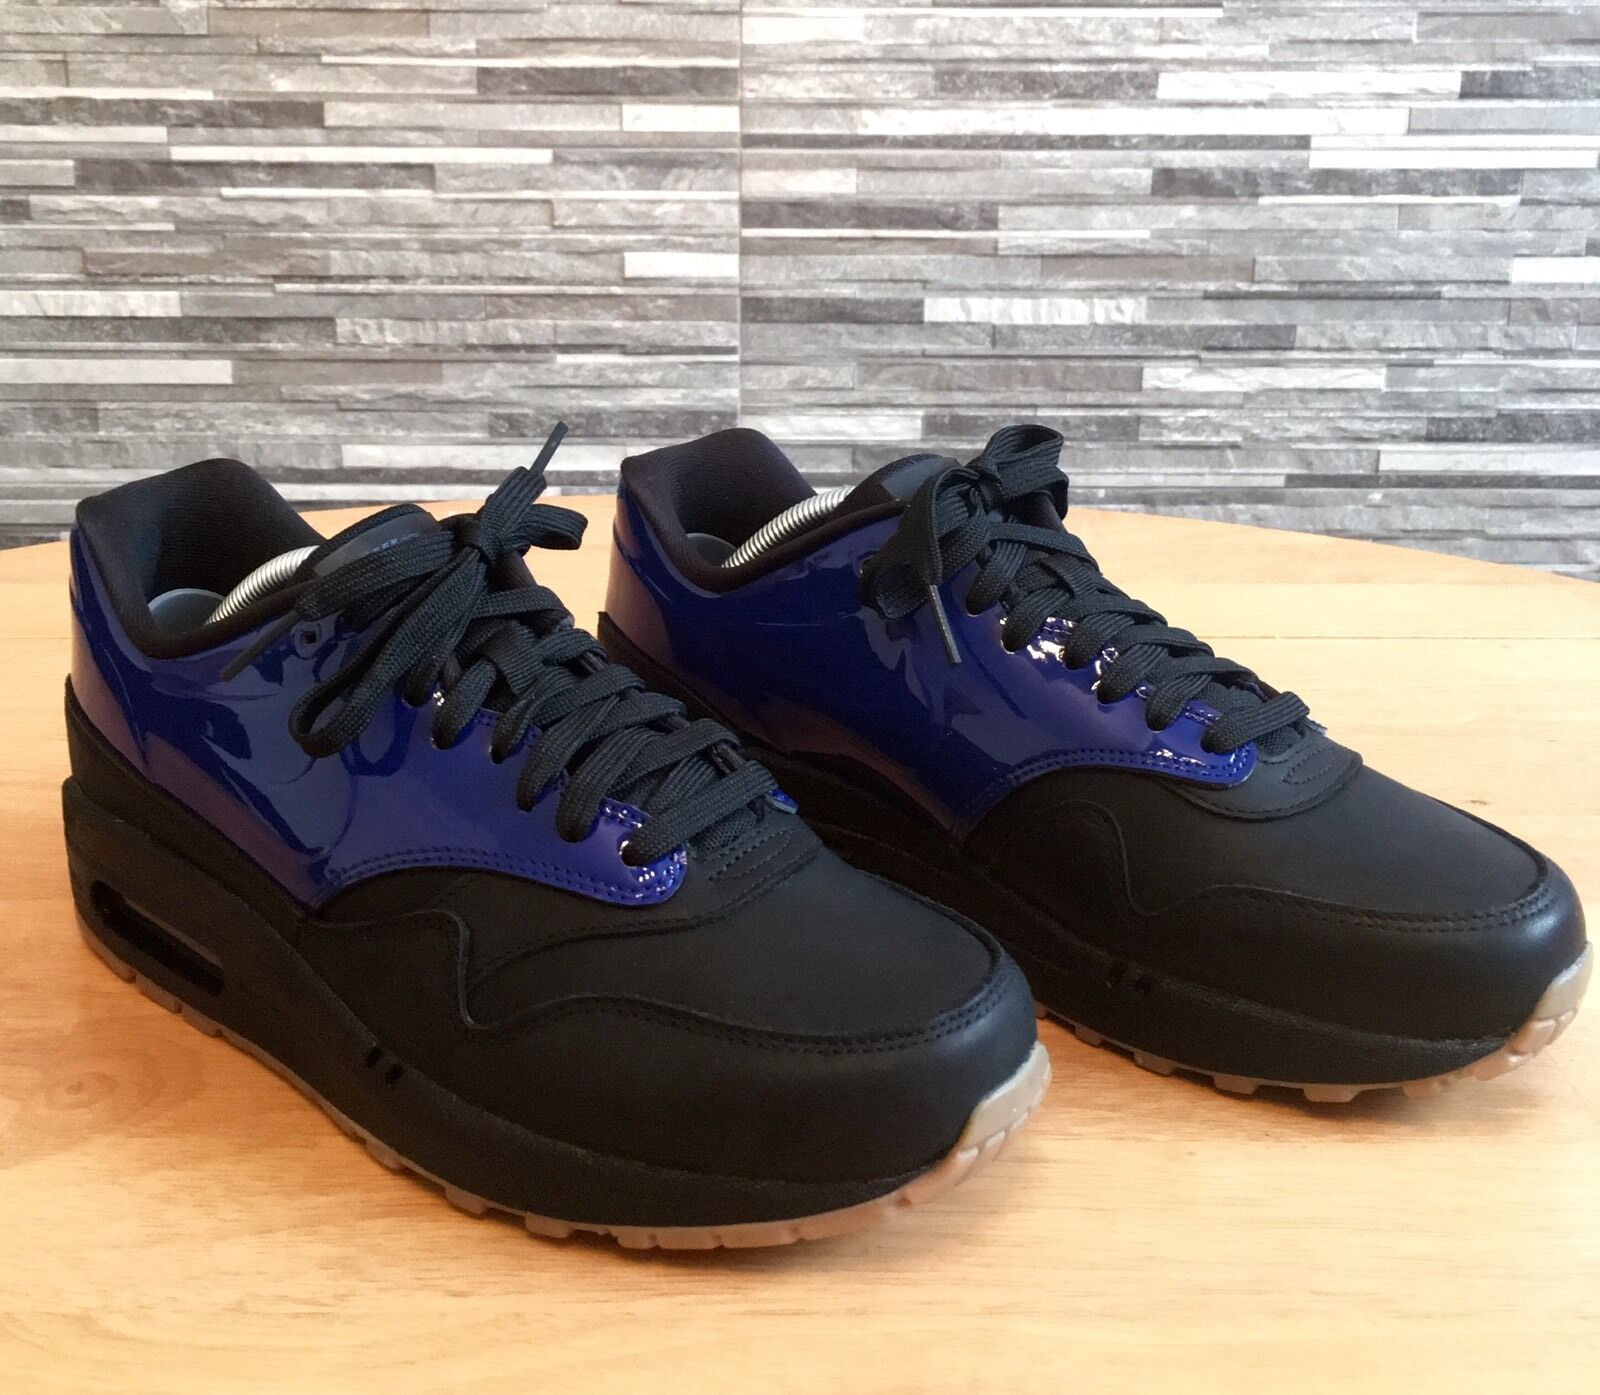 Nike Air Max 1 Vt Deep Royal Blue-Black (Original UK: with a box) Size UK: (Original 6 bf4442